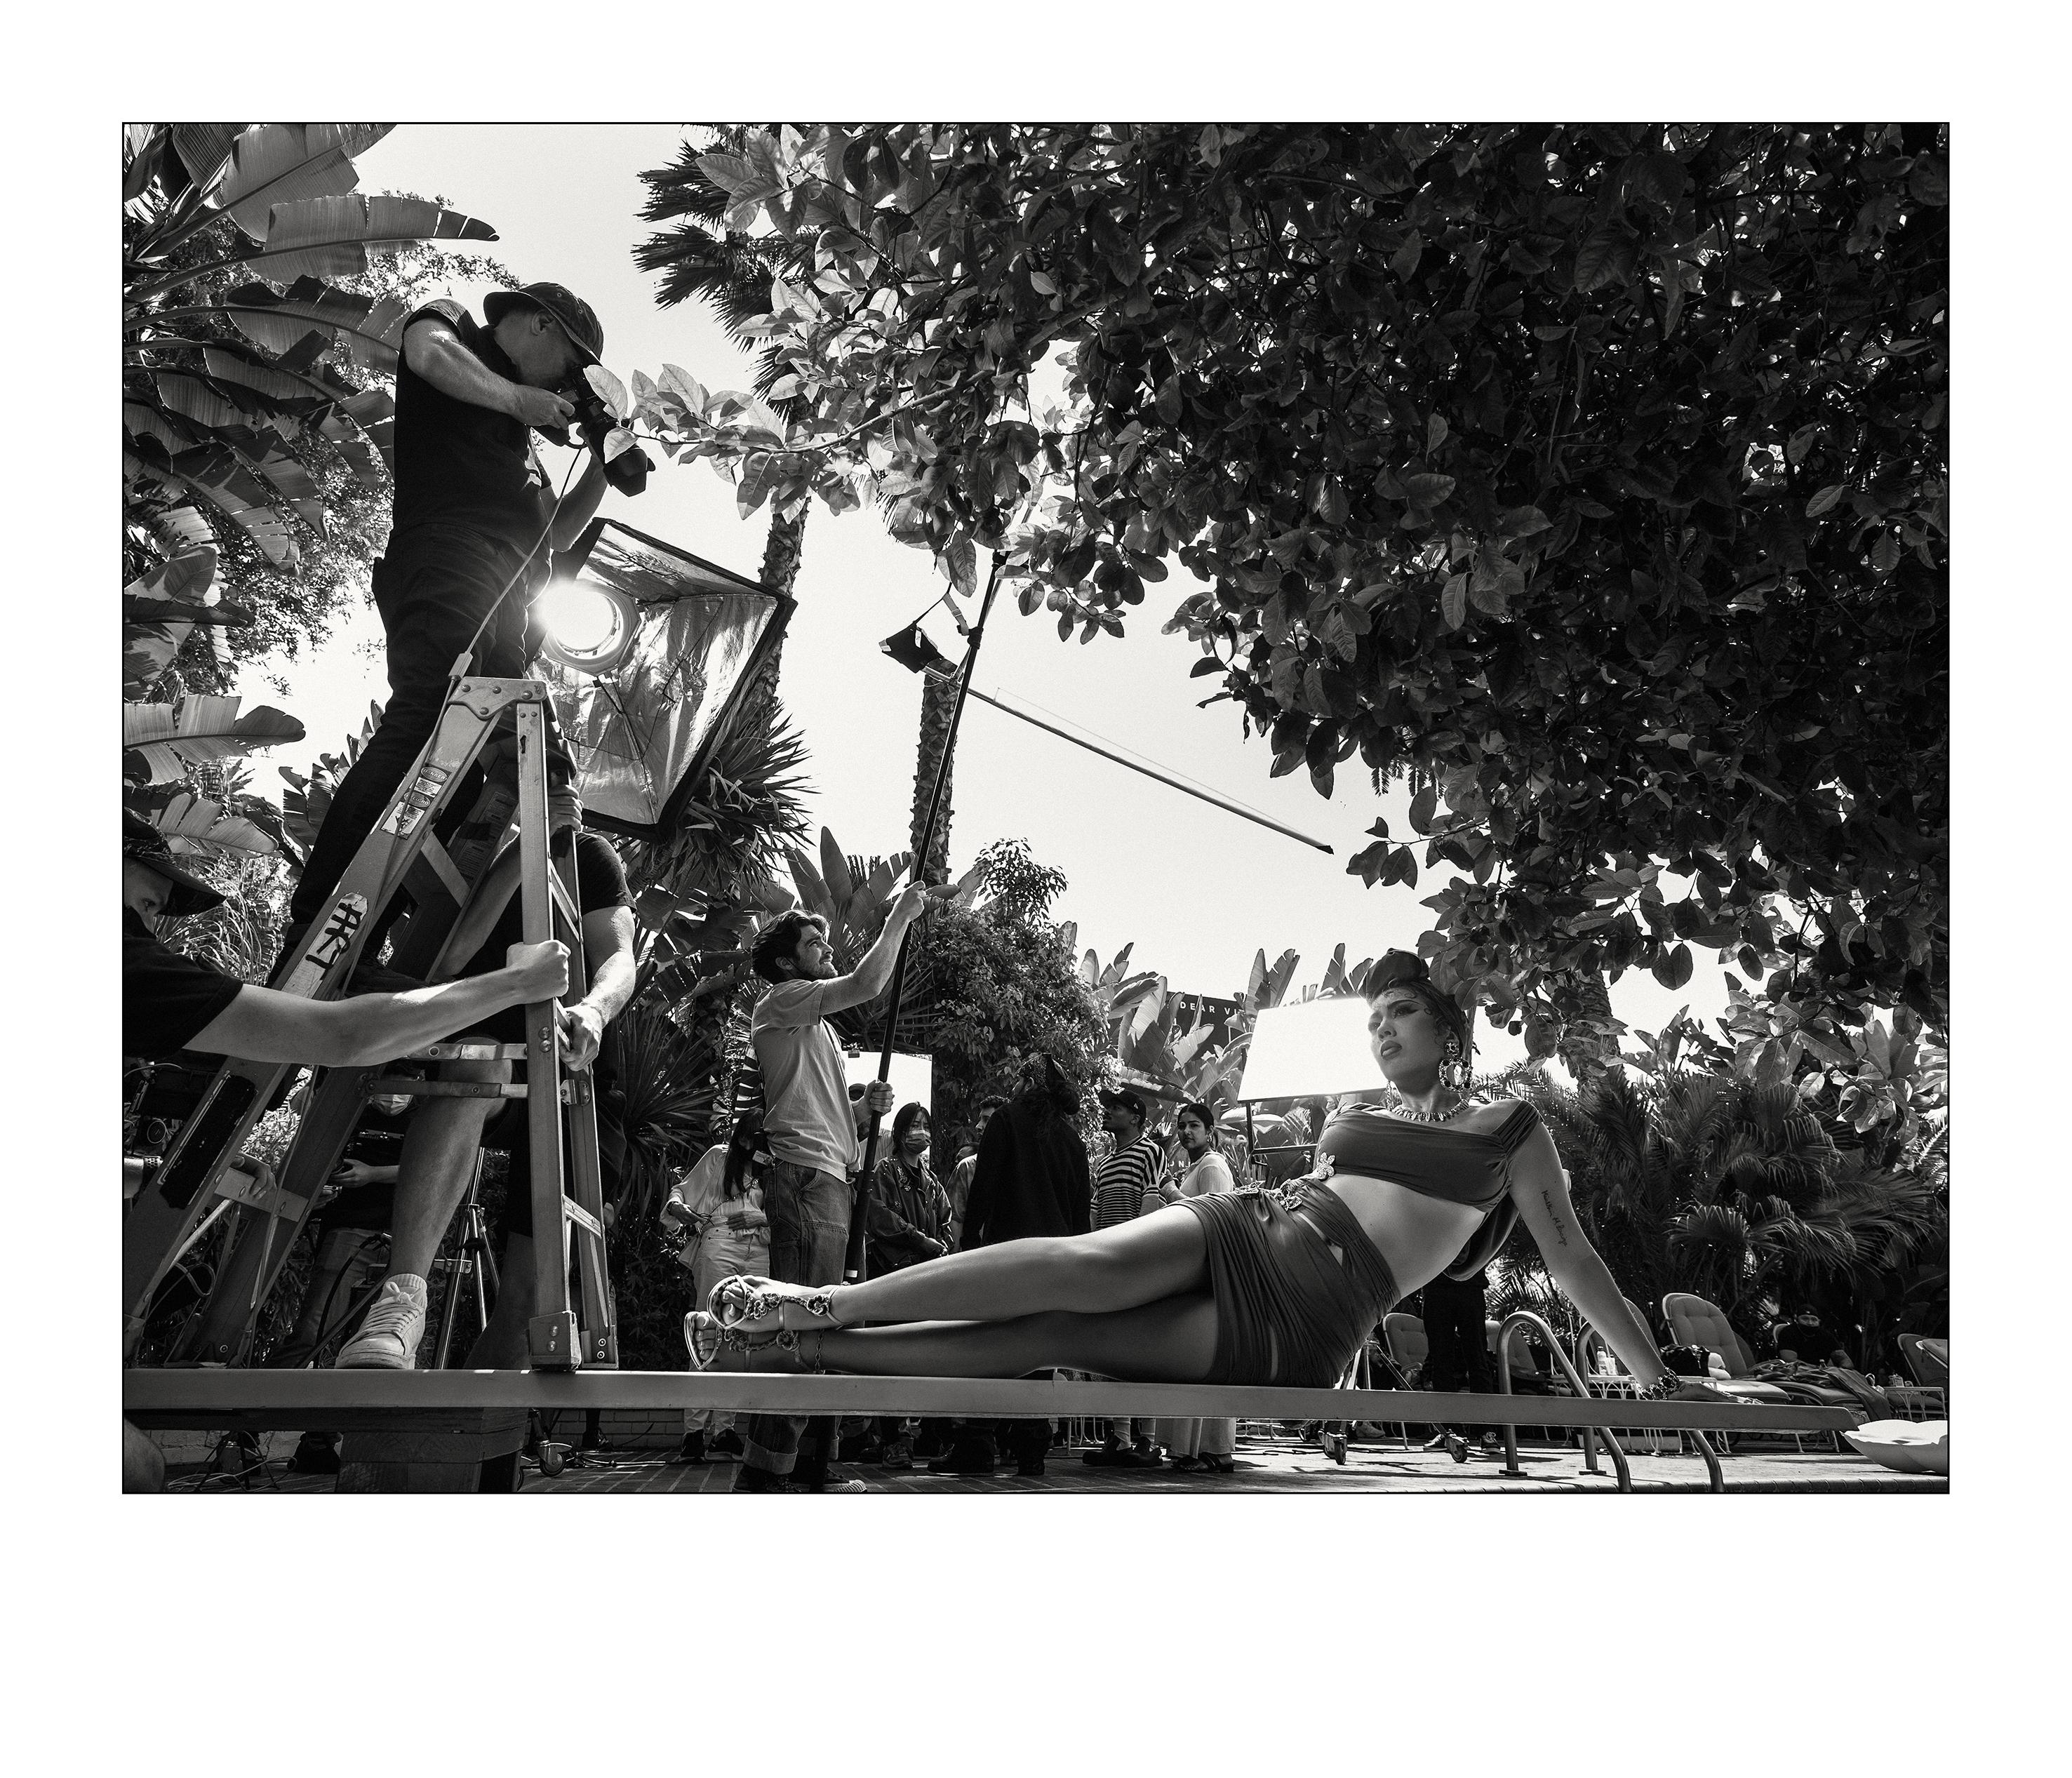 Kali Uchis Nos bastidores do Calendário Pirelli 2022, de Bryan Adams (Foto Alessandro Scotti)